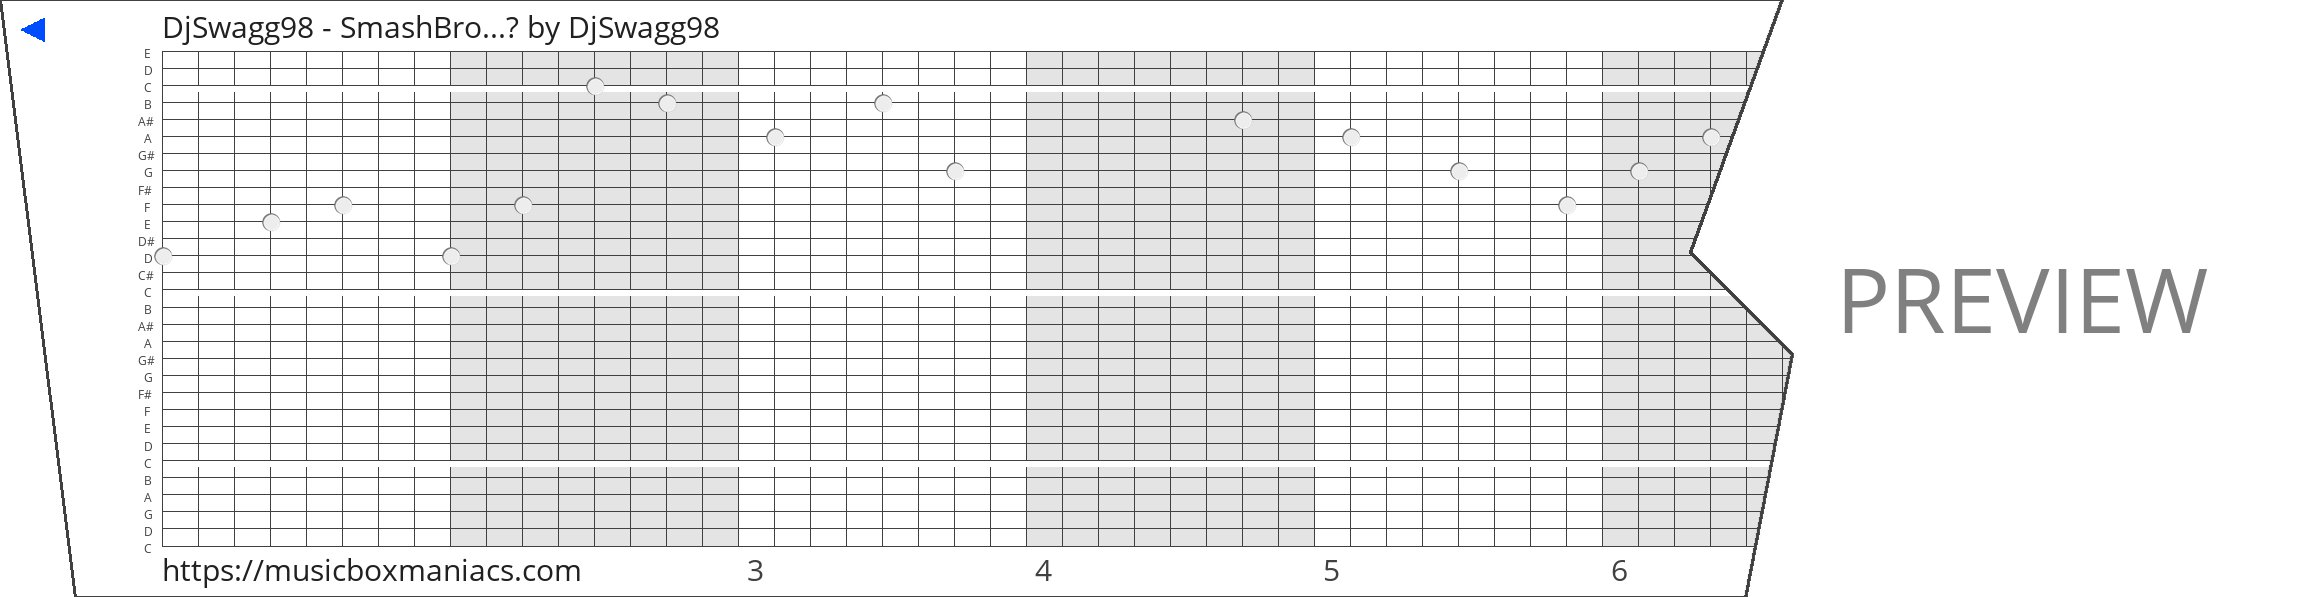 DjSwagg98 - SmashBro...? 30 note music box paper strip